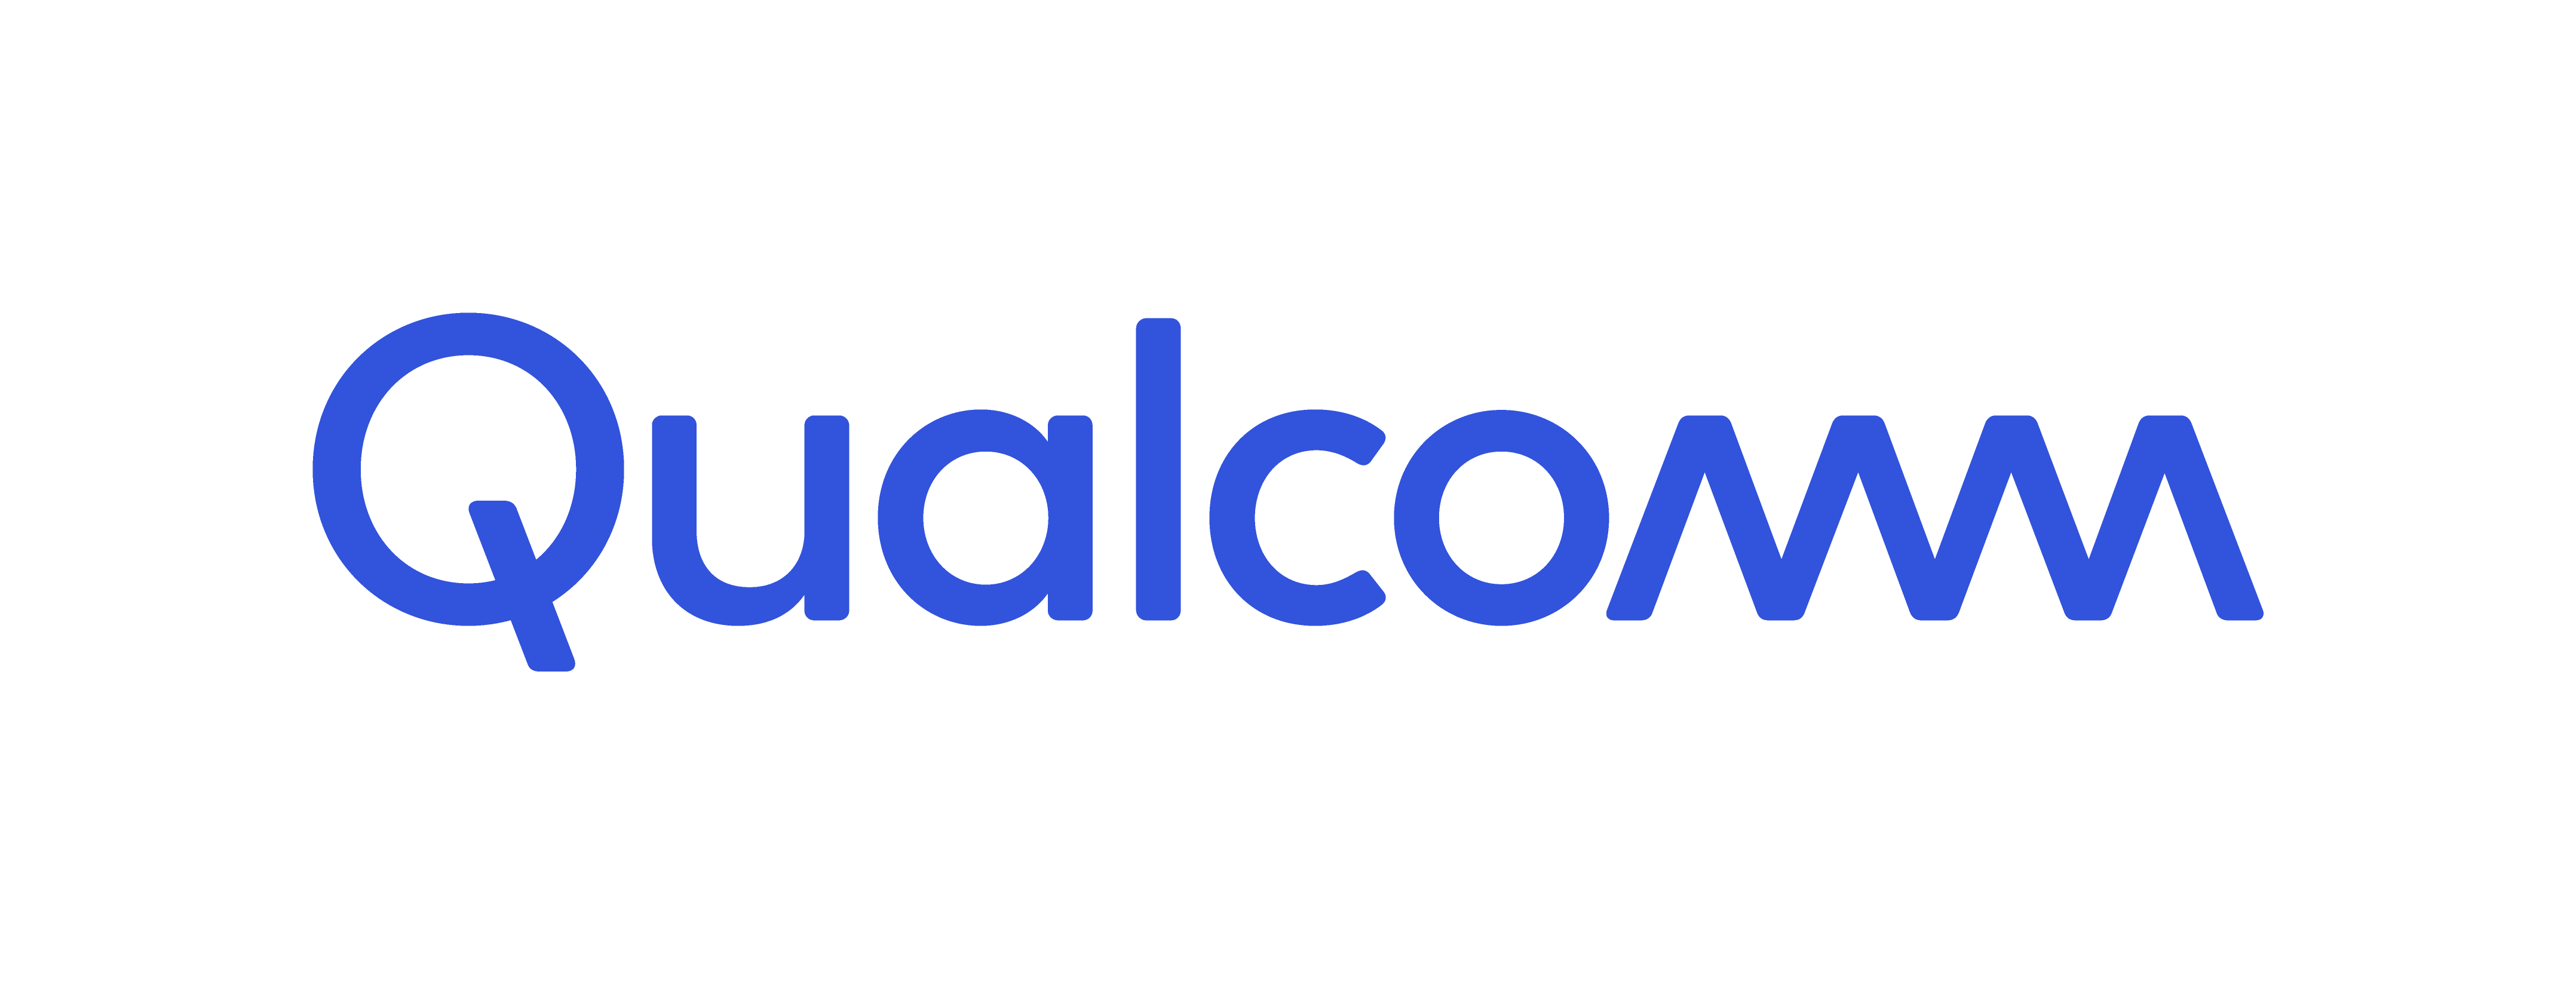 Qualcomm Technologies Inc.